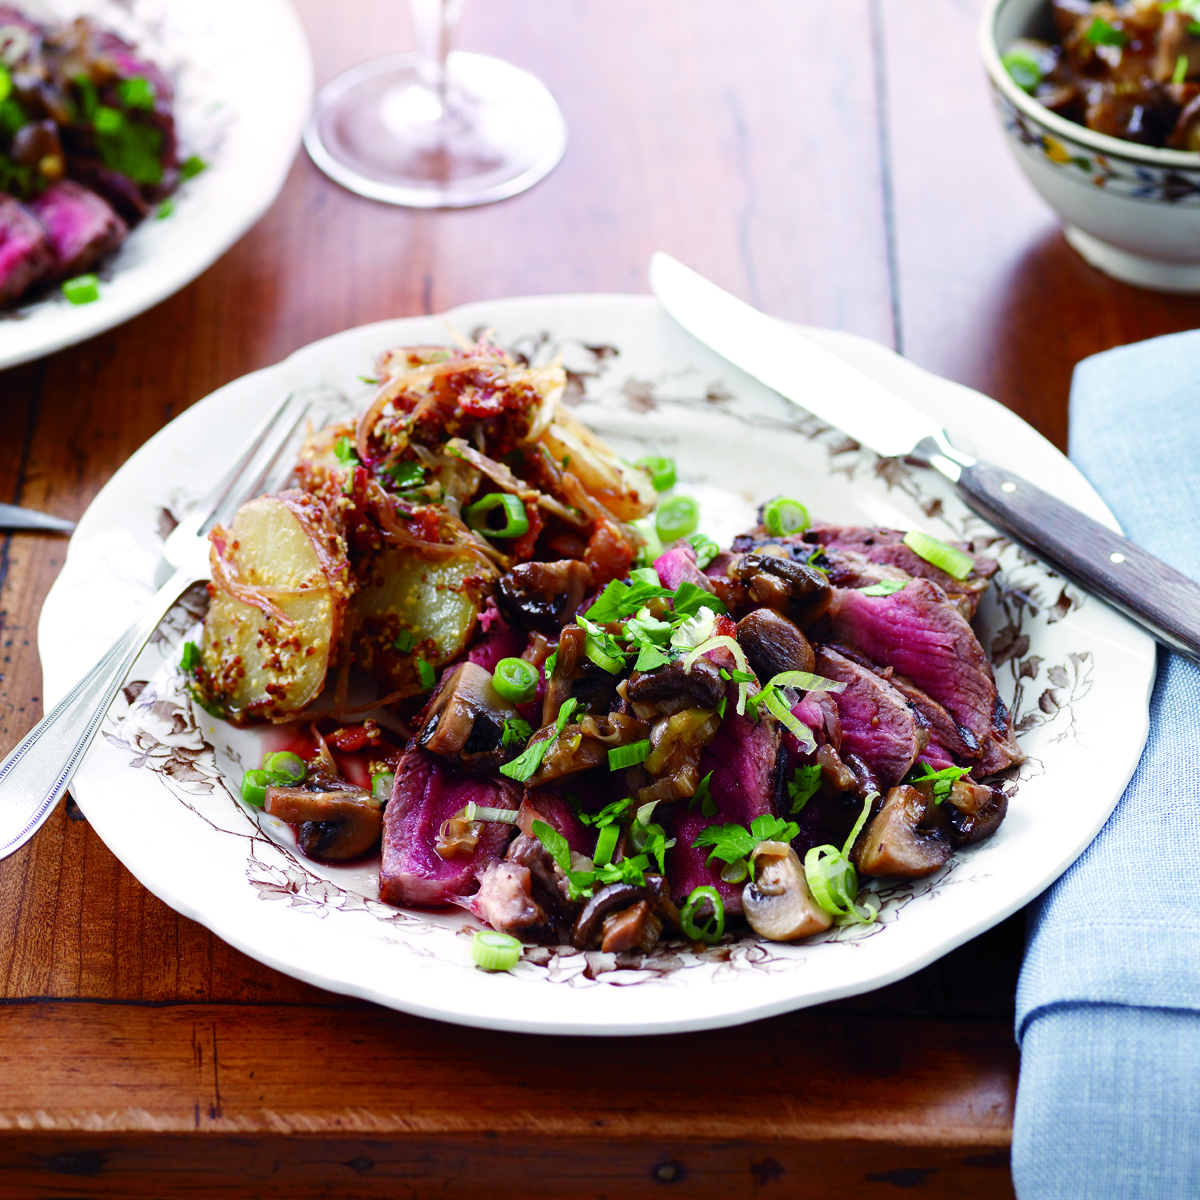 Sliced Steak and Mushrooms with Warm Potato Salad